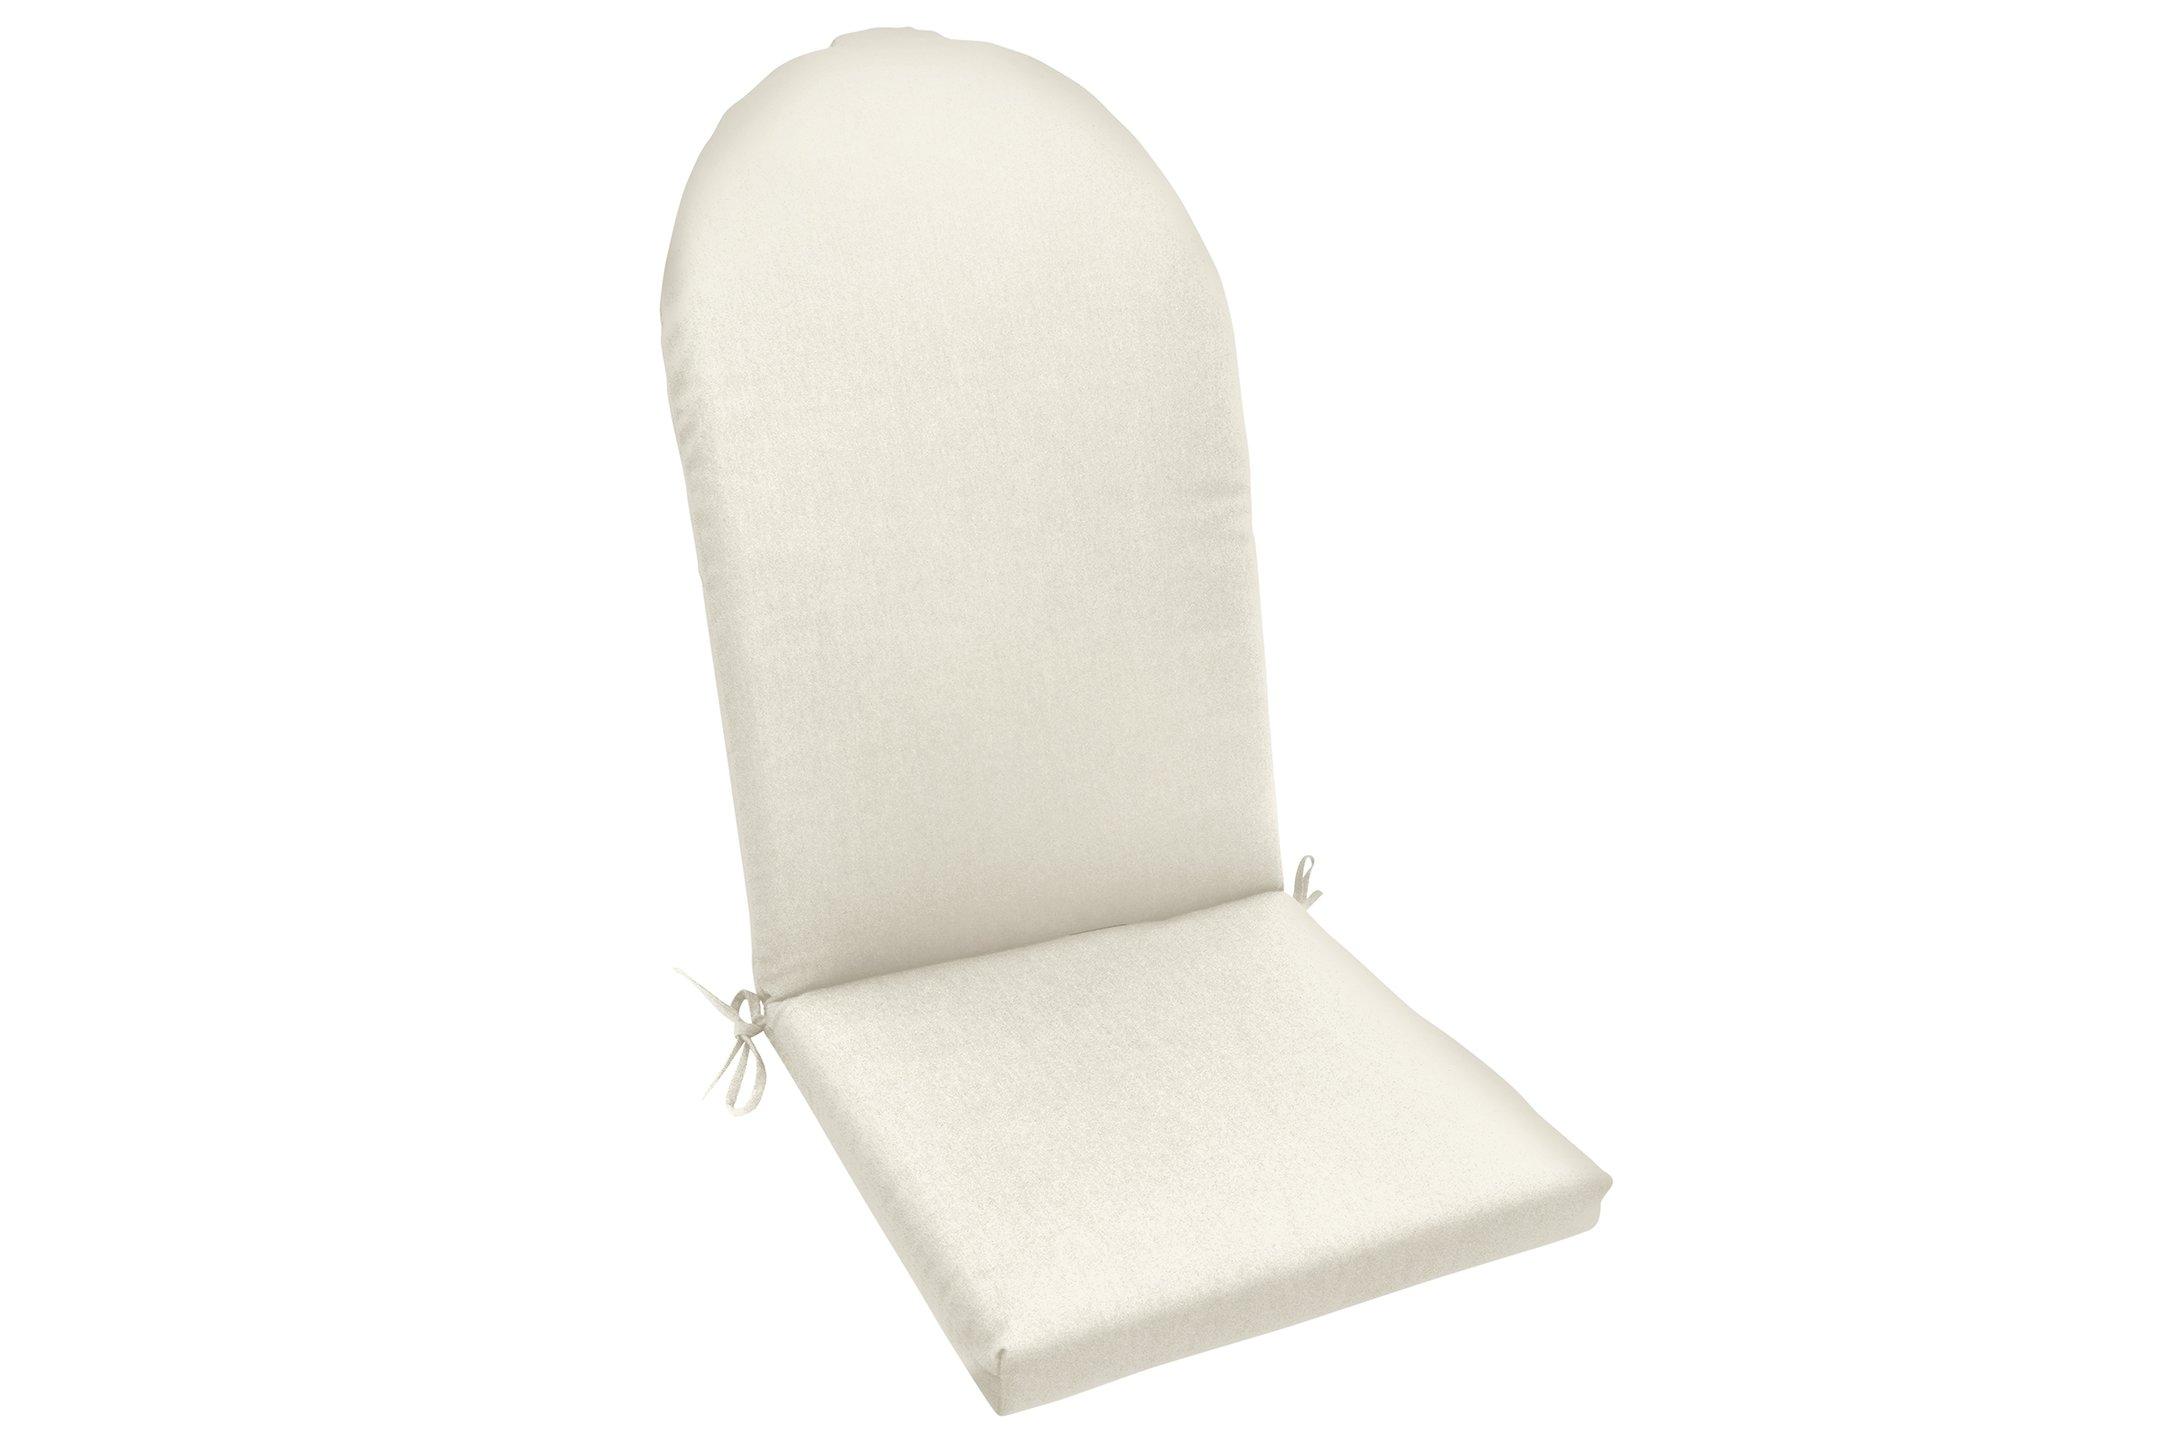 "Amazon Custom Furnishings x Easy Way Products 19479U-E5404 Custom Knife Edge Adirondack Chair Cushion, 47"" Length x 22"" Width, Sunbrella Canvas Natural"